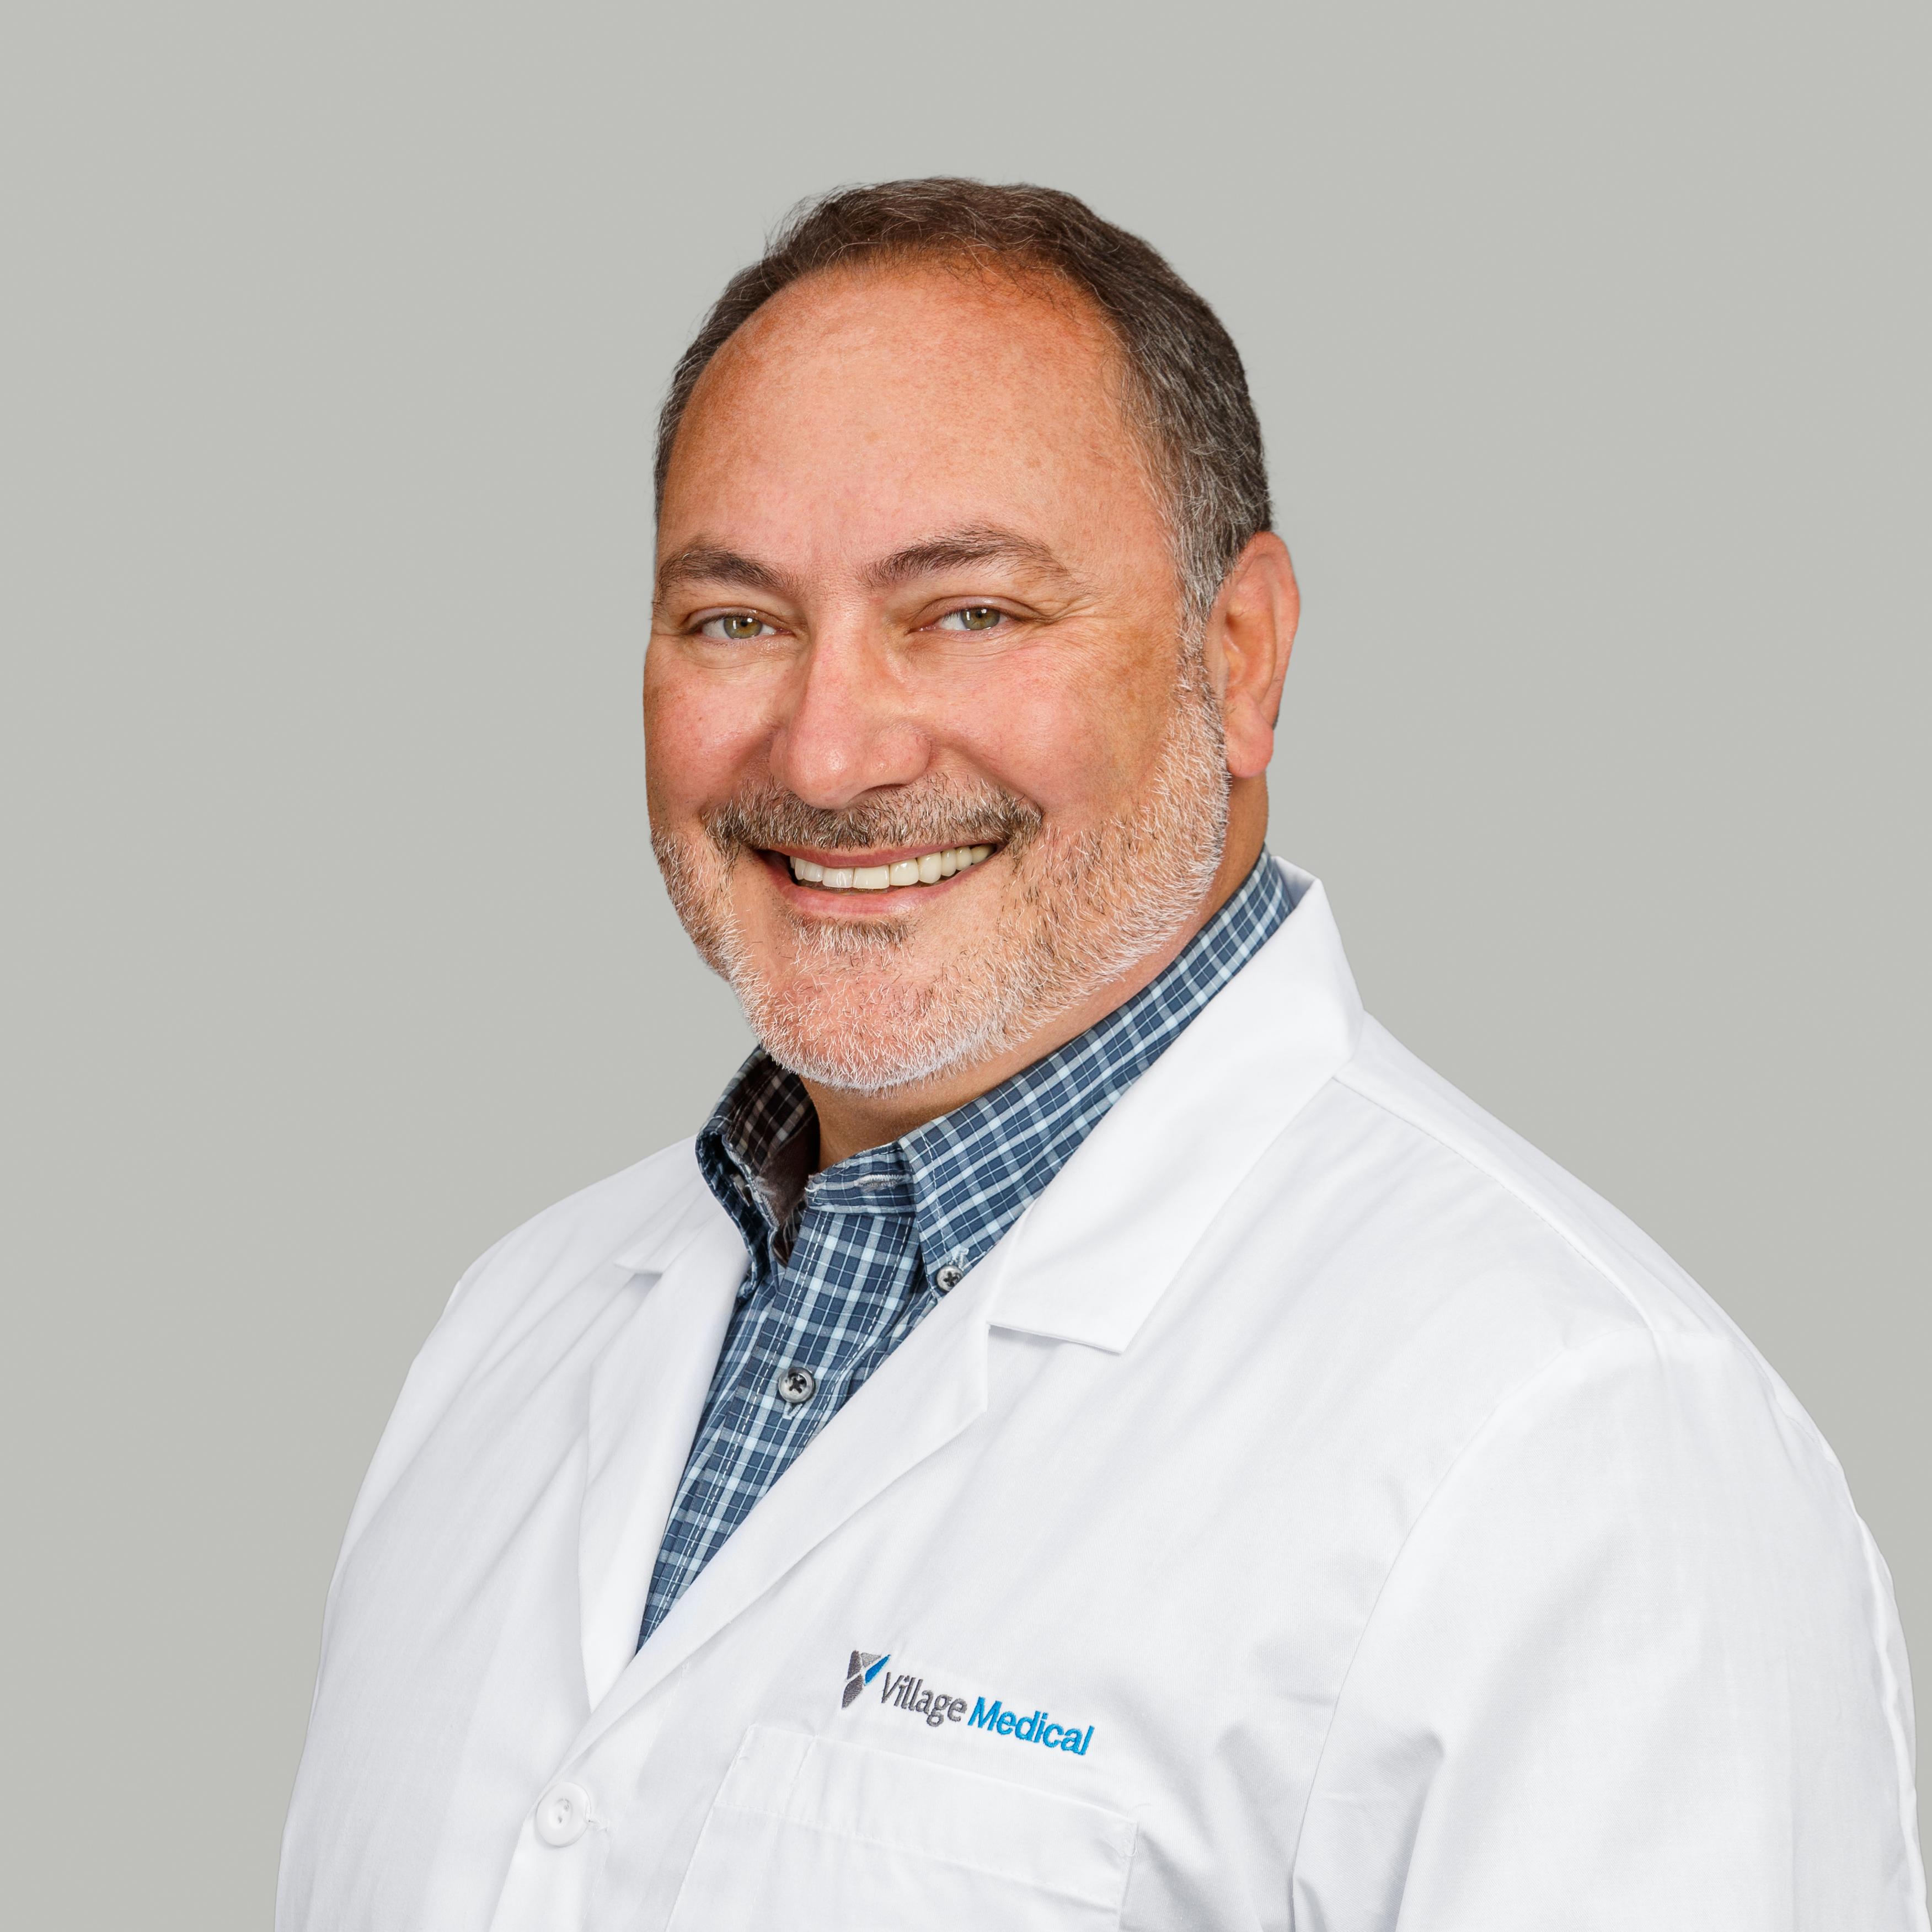 Michael Adams, MD